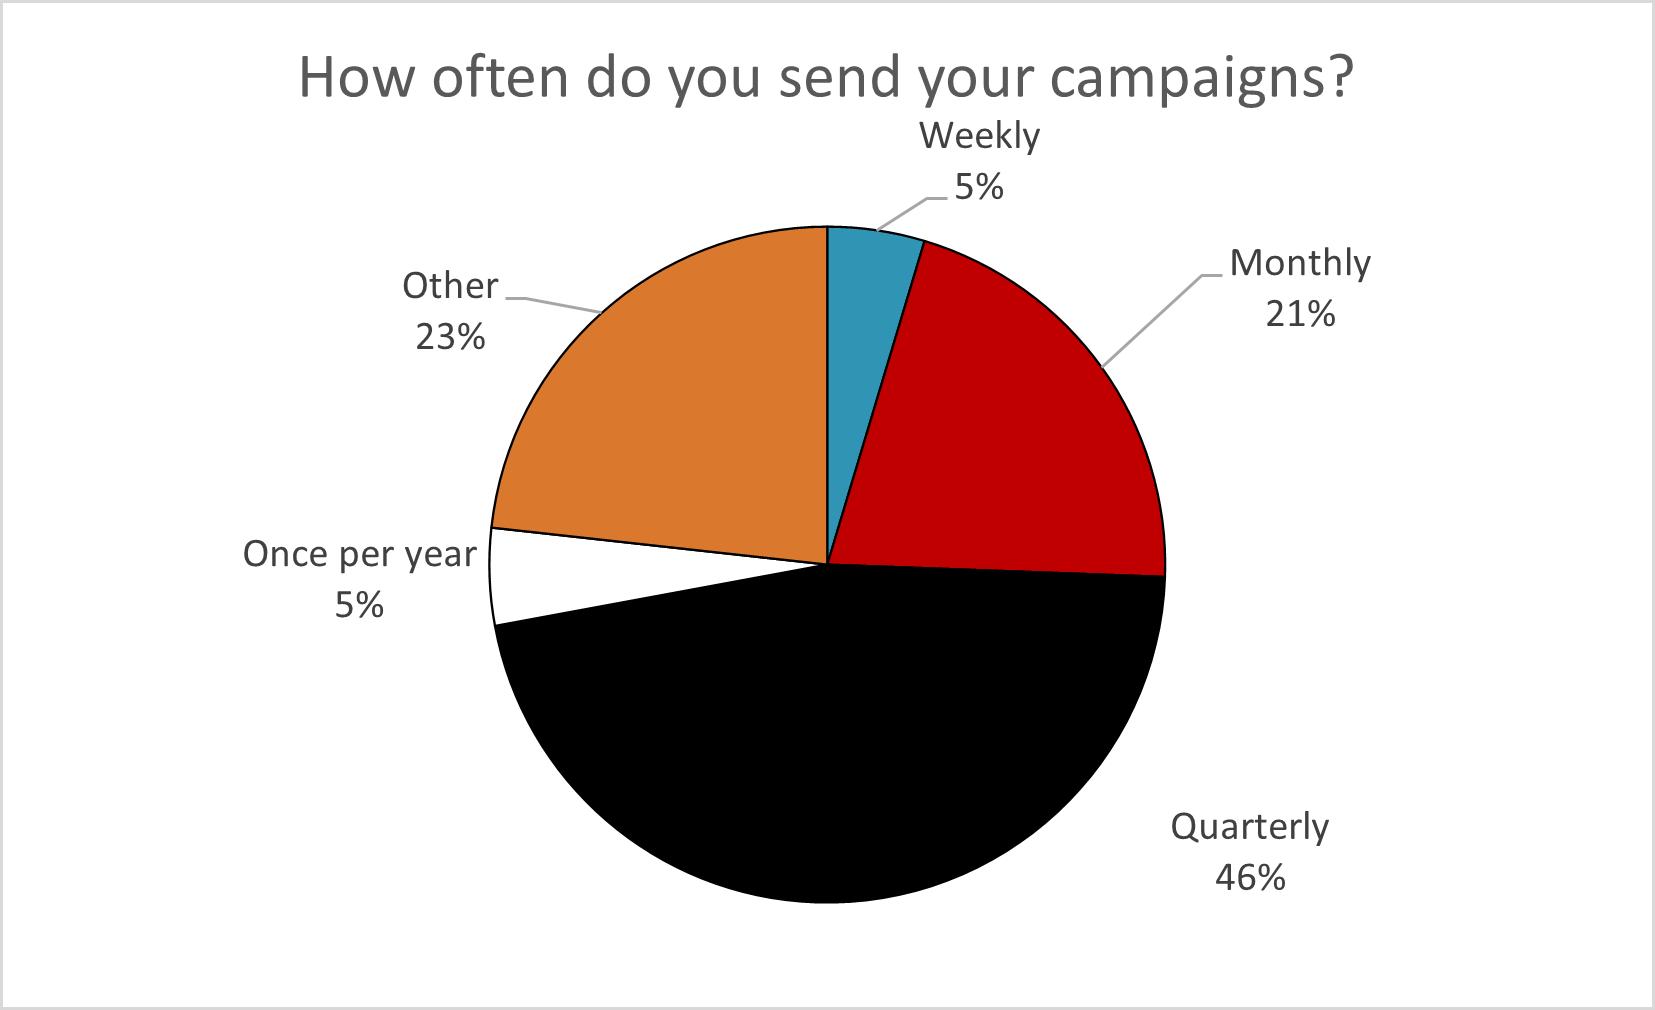 Email Survey Image 4